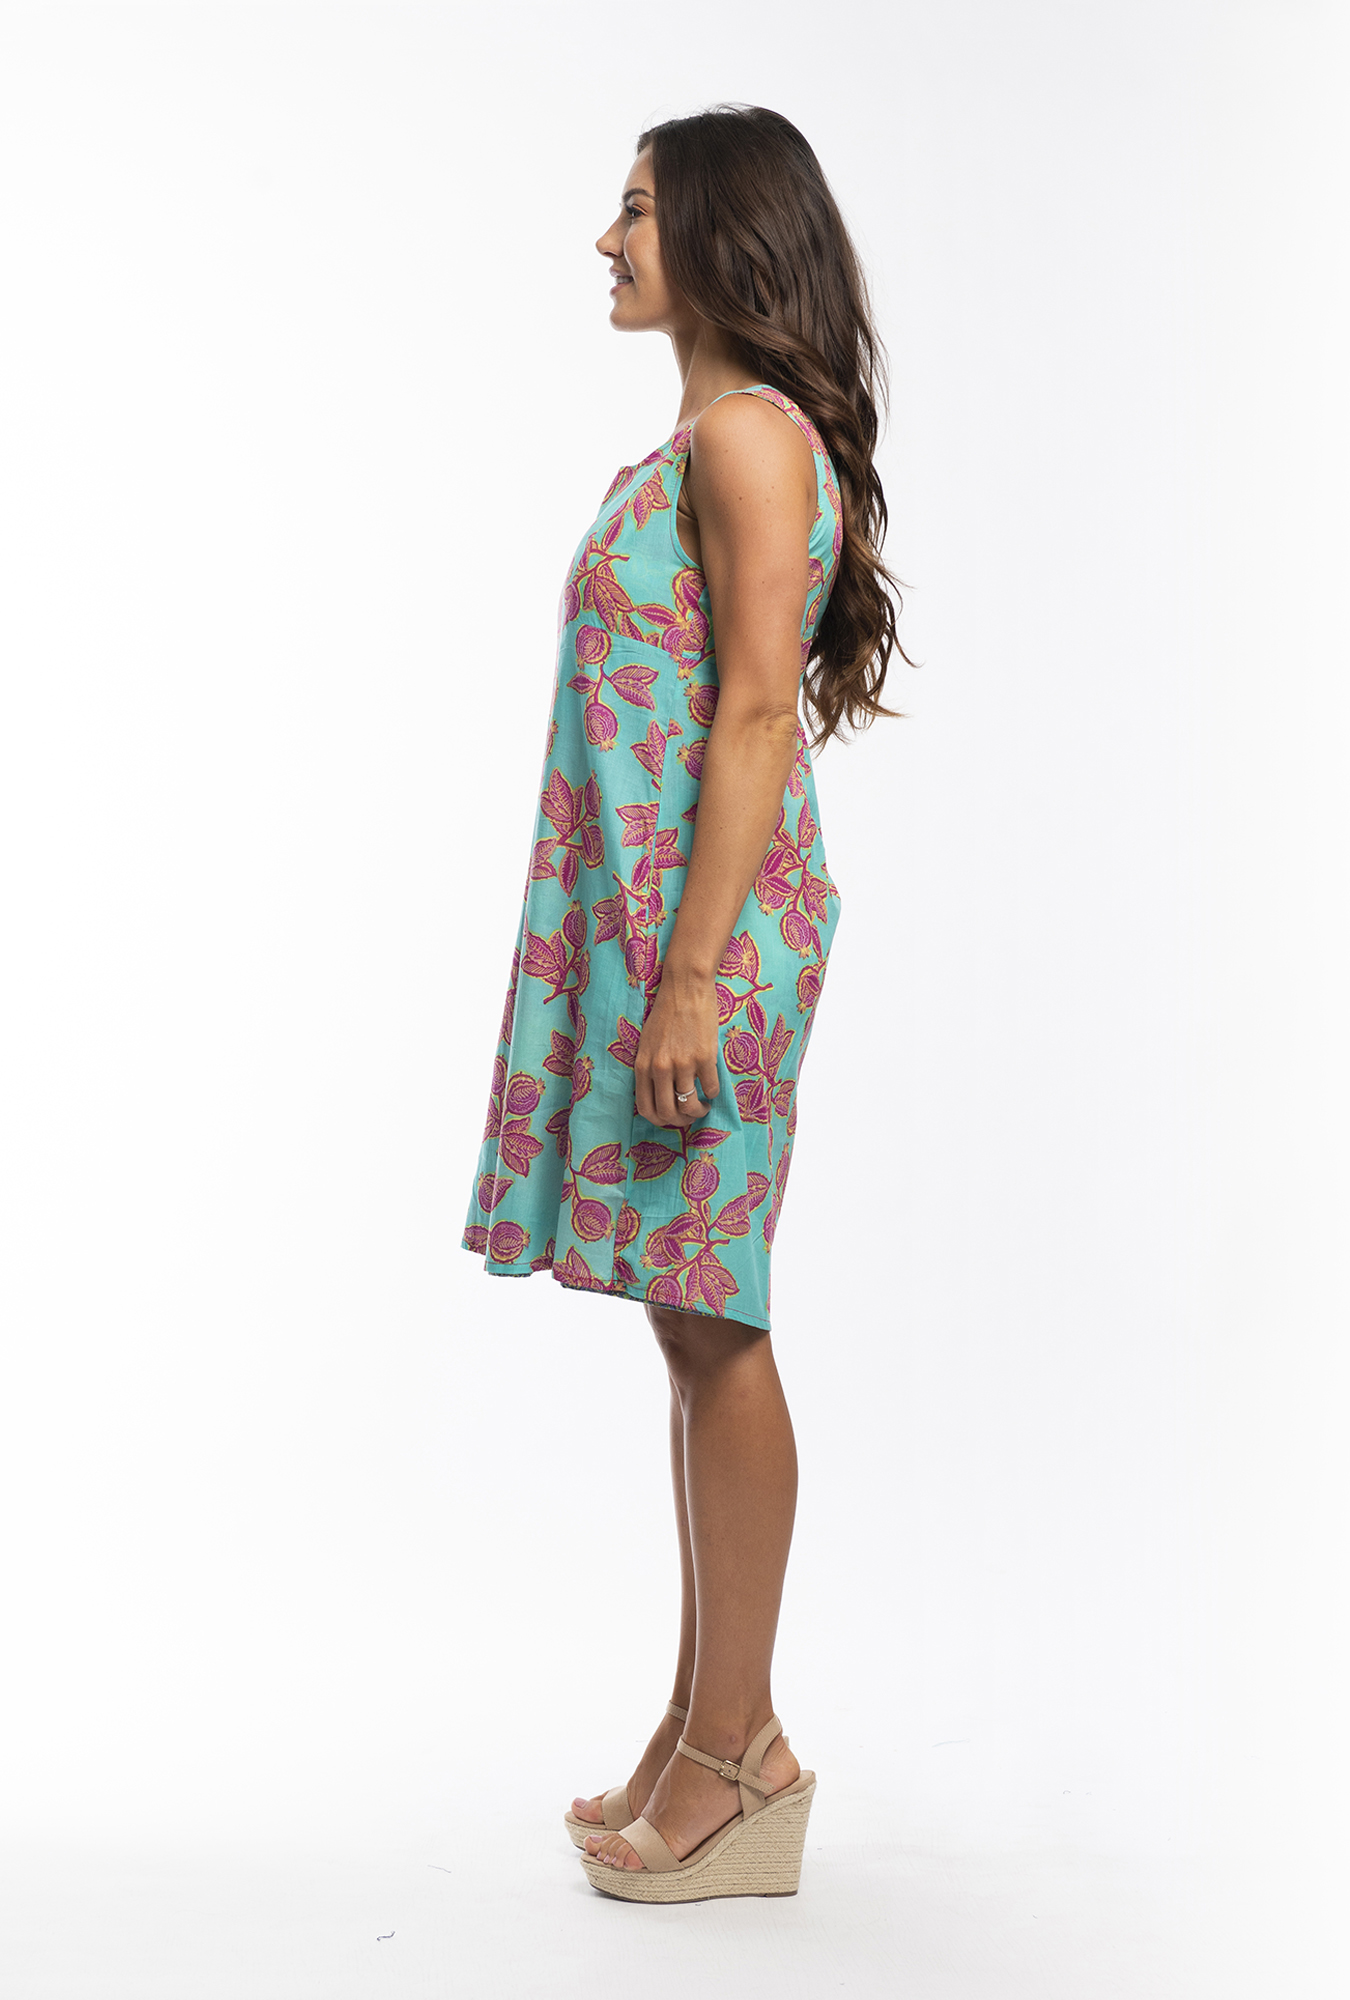 Izzi Reversible Dress in Barbaroux